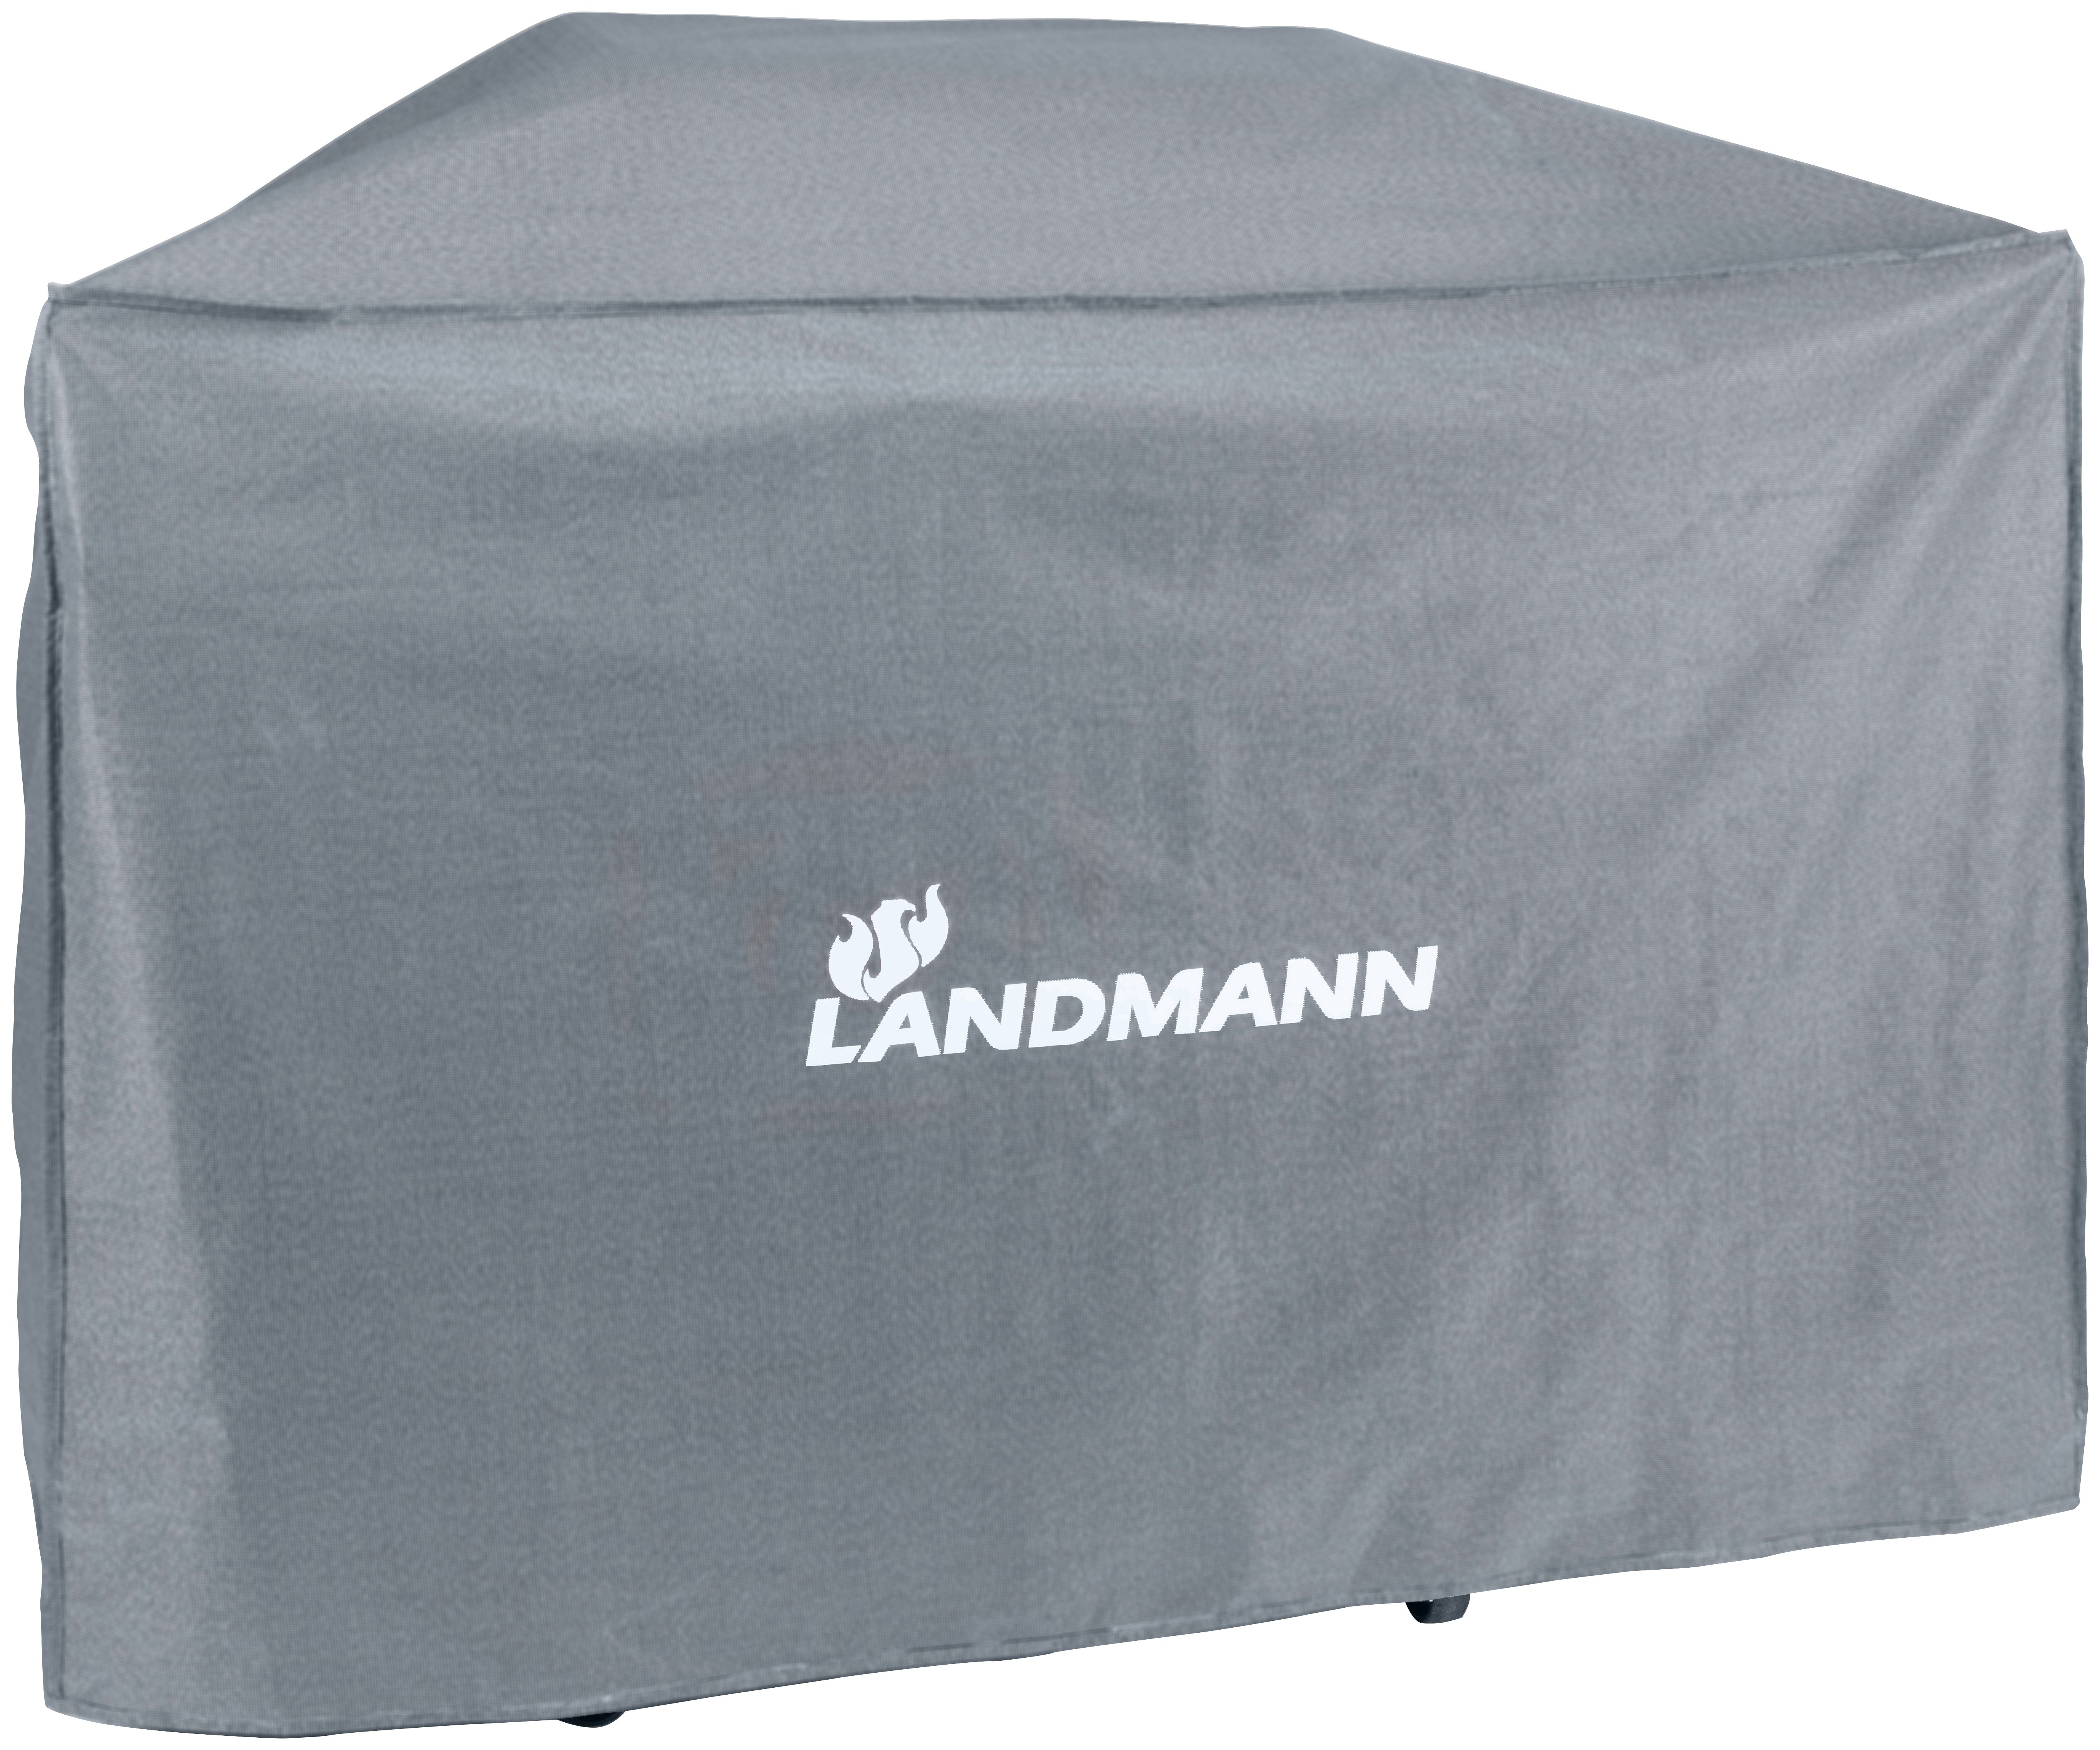 Image of Landmann Premium Extra Large Cover